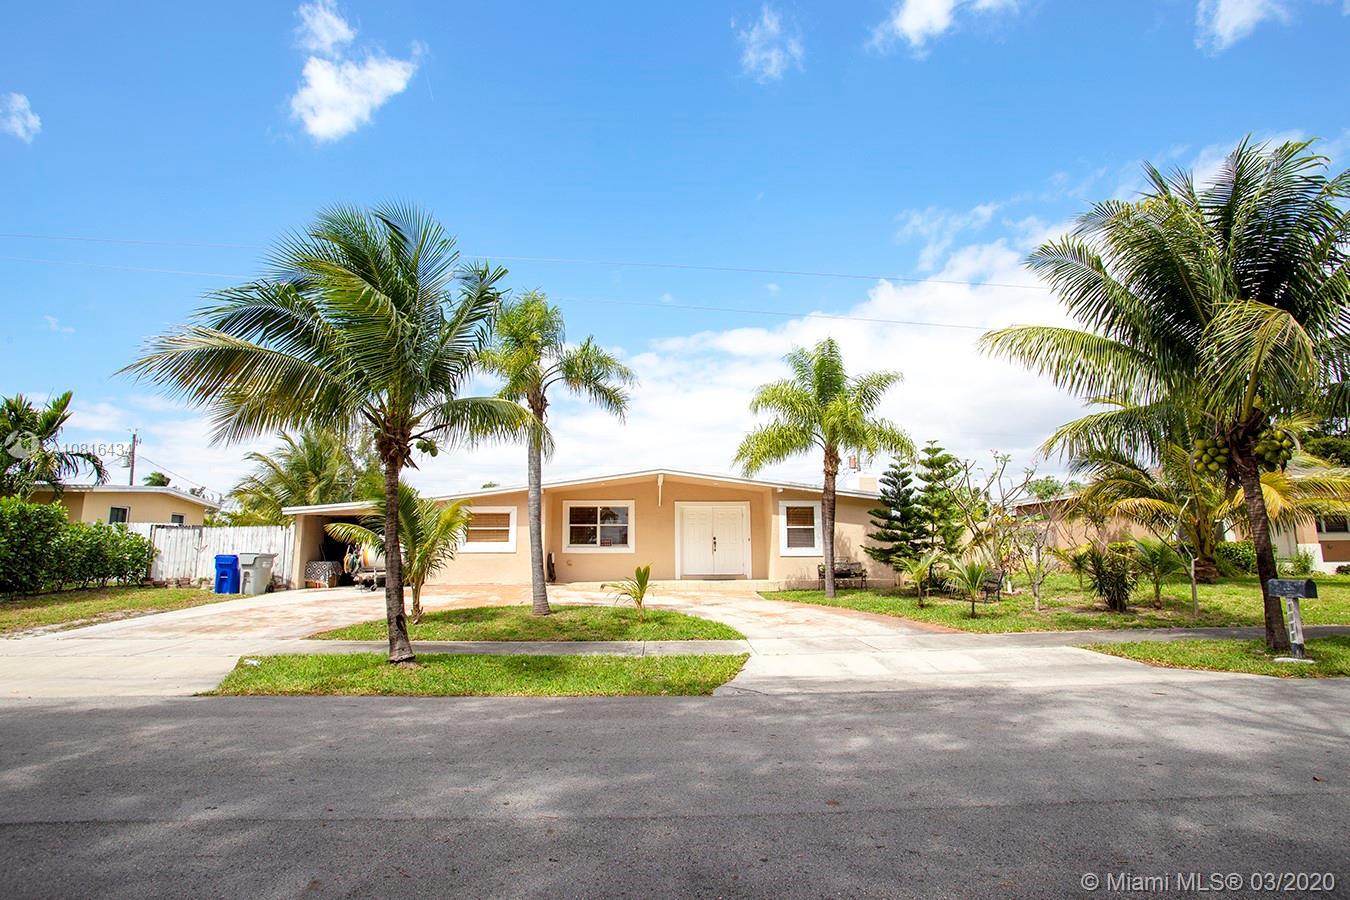 1411 NE 43, Pompano Beach, FL 33064 - Pompano Beach, FL real estate listing